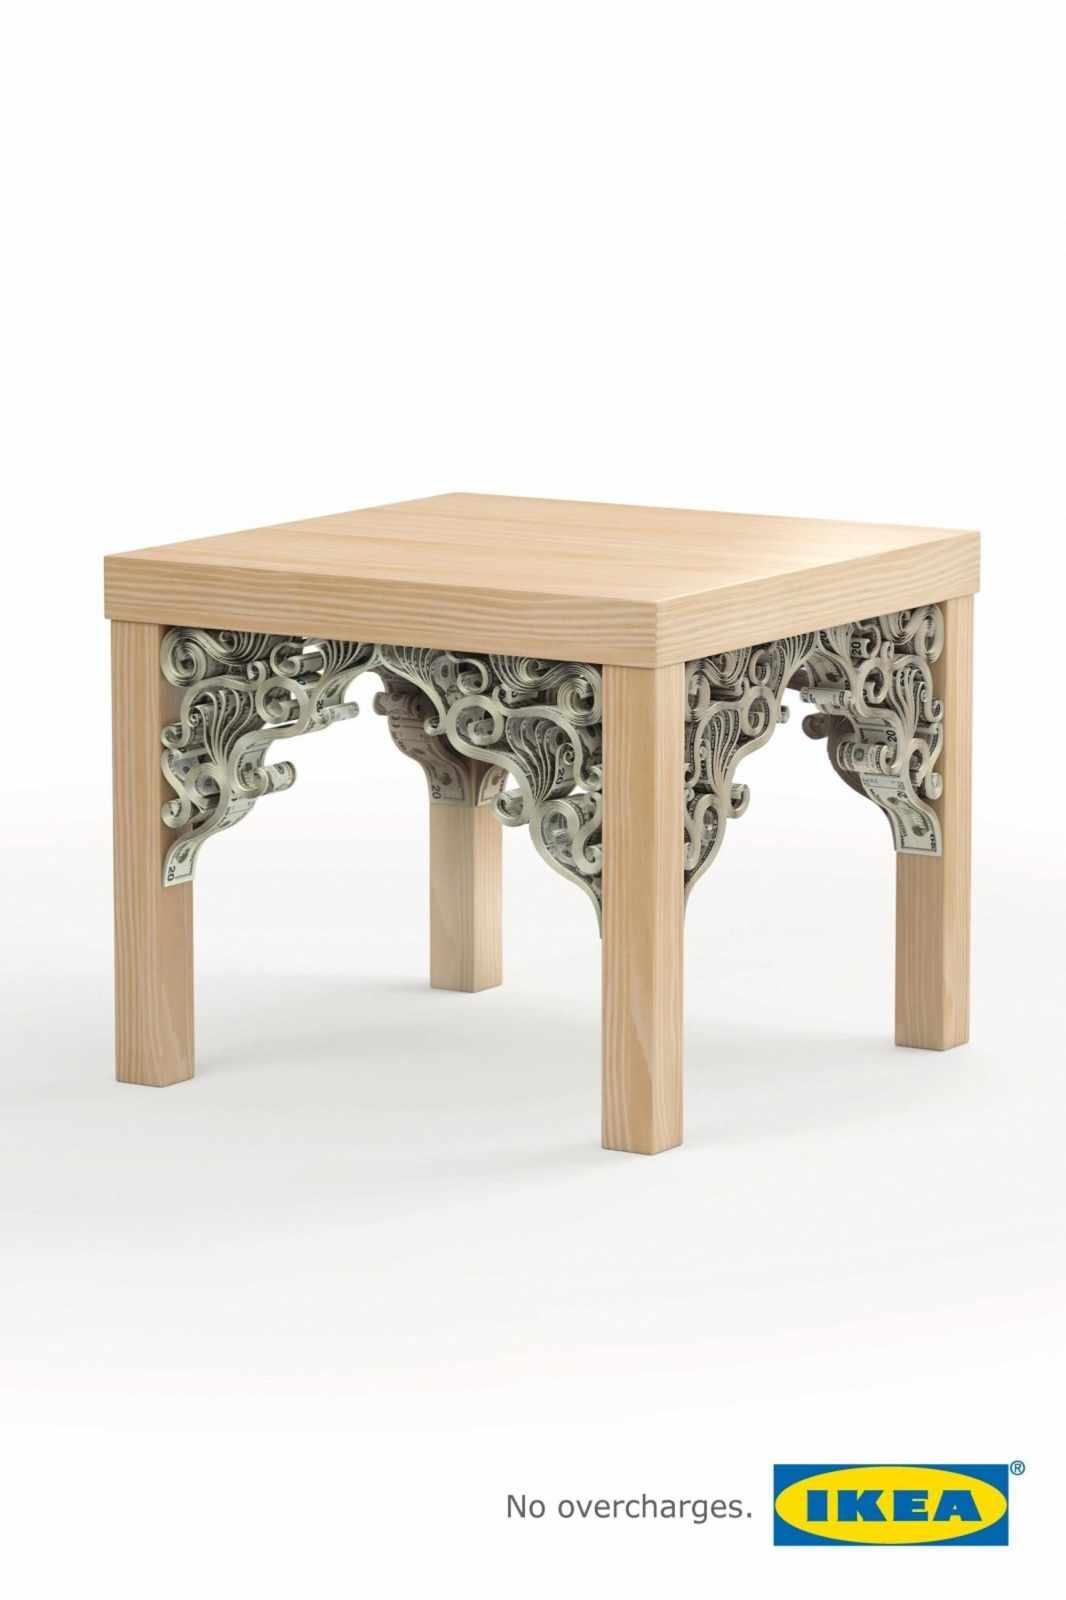 ikea_coffee_table